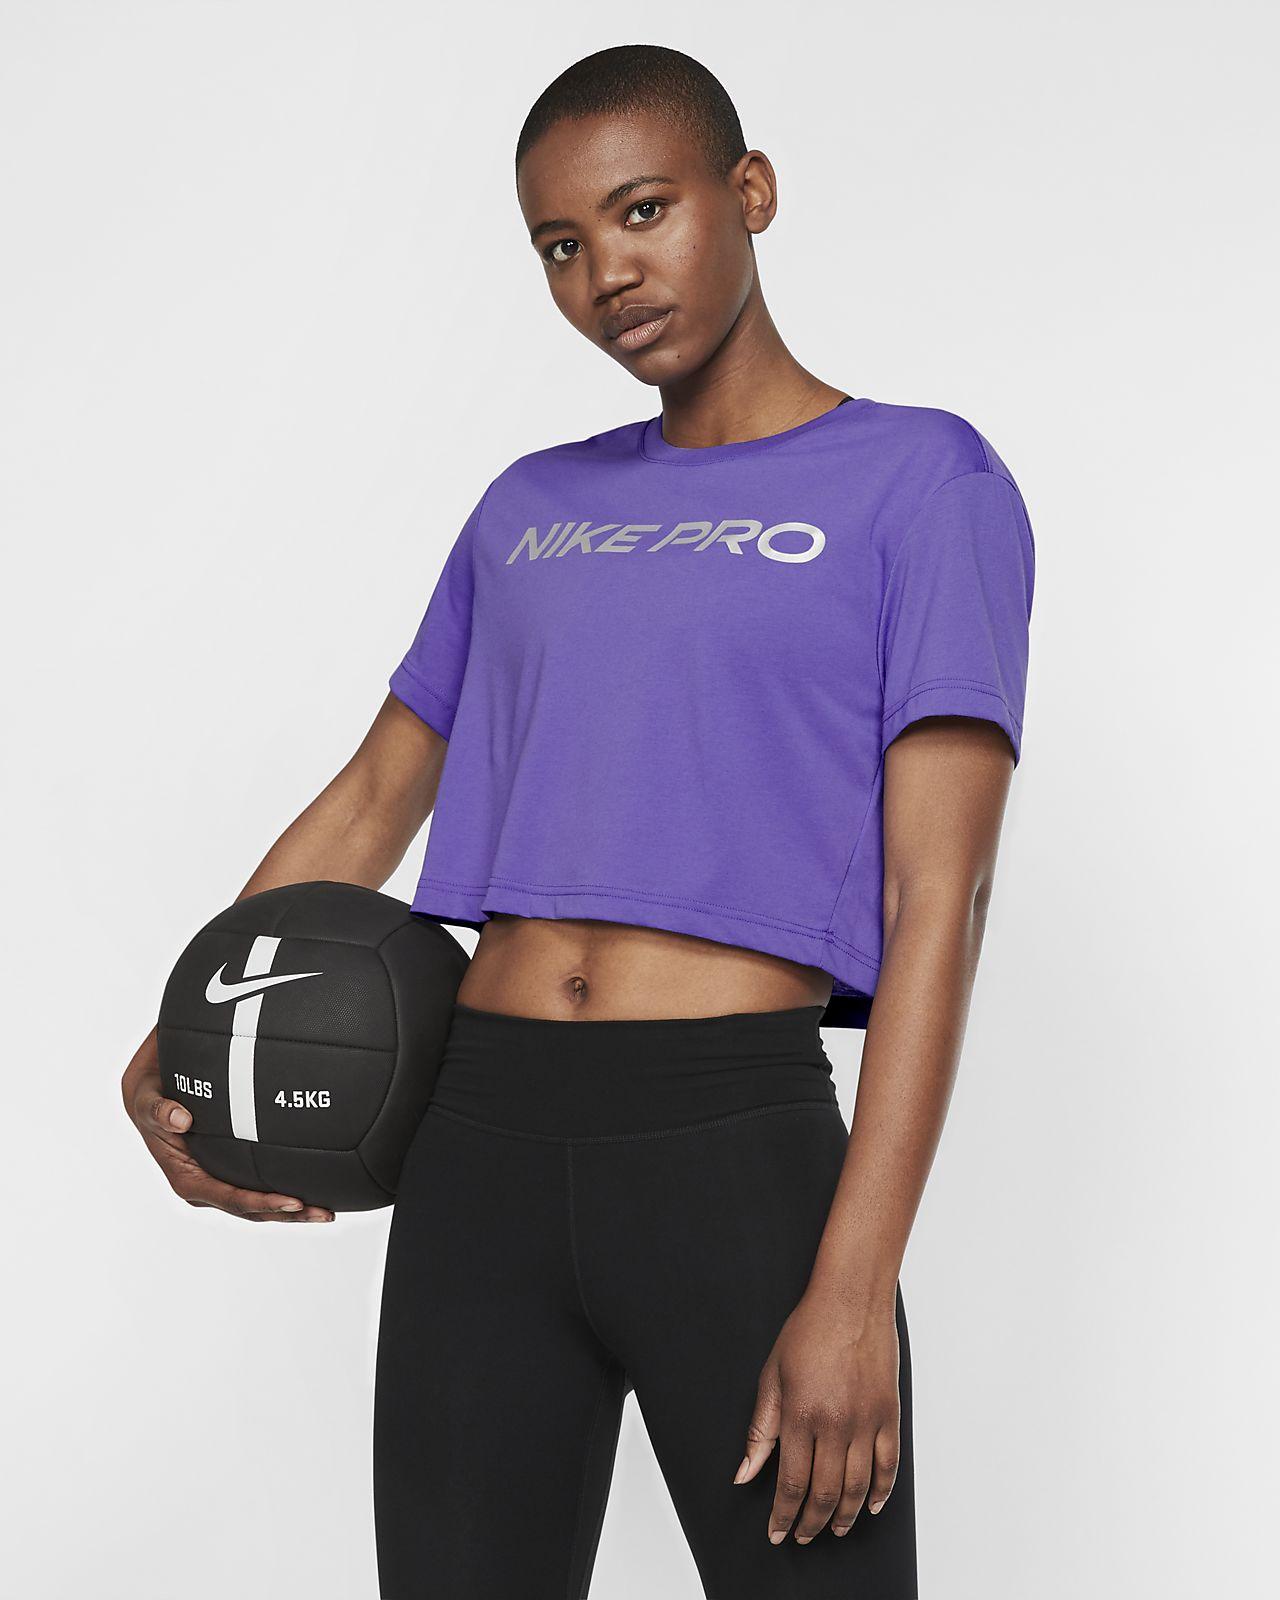 Женская футболка для тренинга Nike Dri-FIT